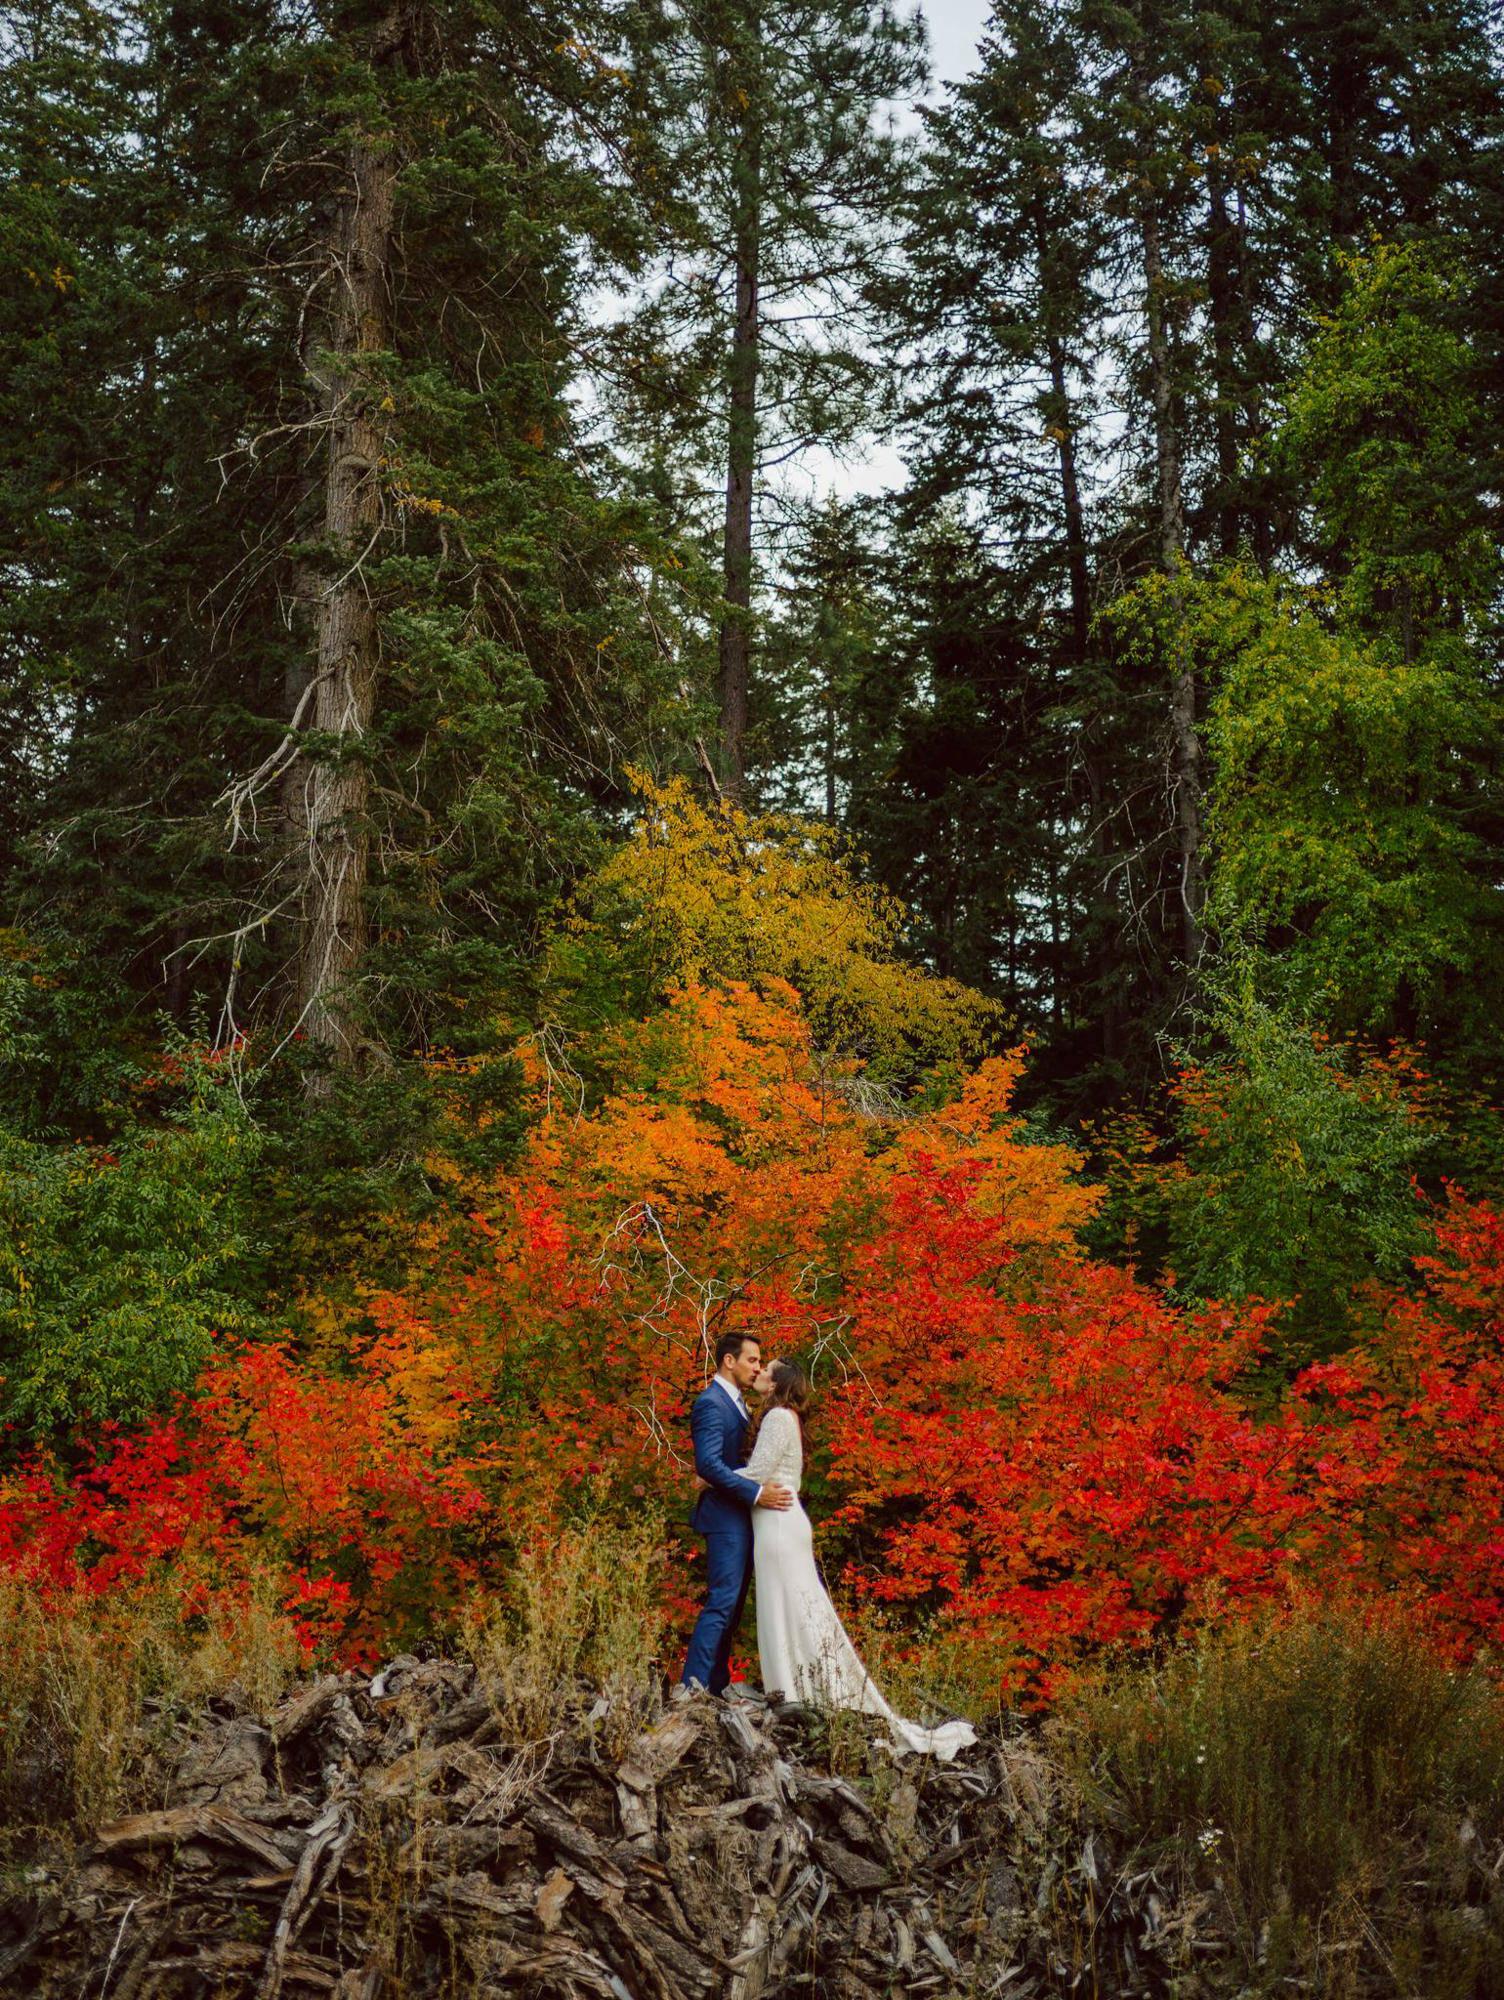 Fall wedding portrait against autumn leaves - Photo by Benj Haisch